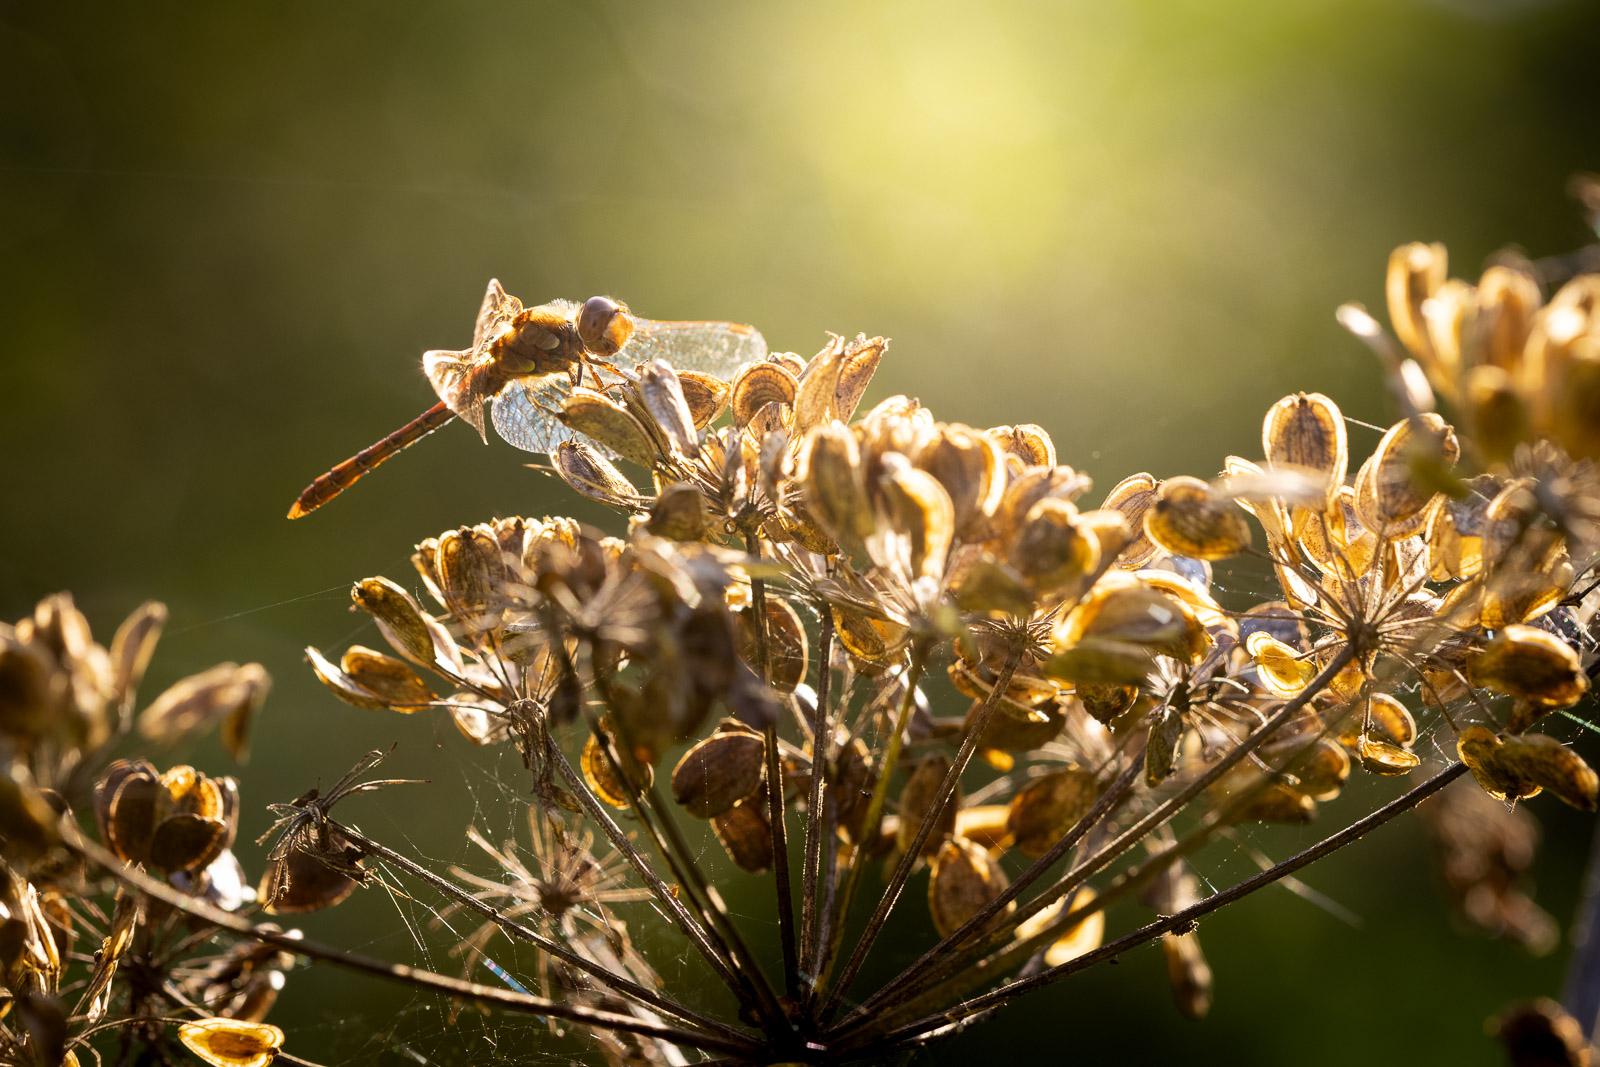 Common Darter (Sympetrum striolatum) on Hogweed - Westhay, Somerset, UK. ID BR56841